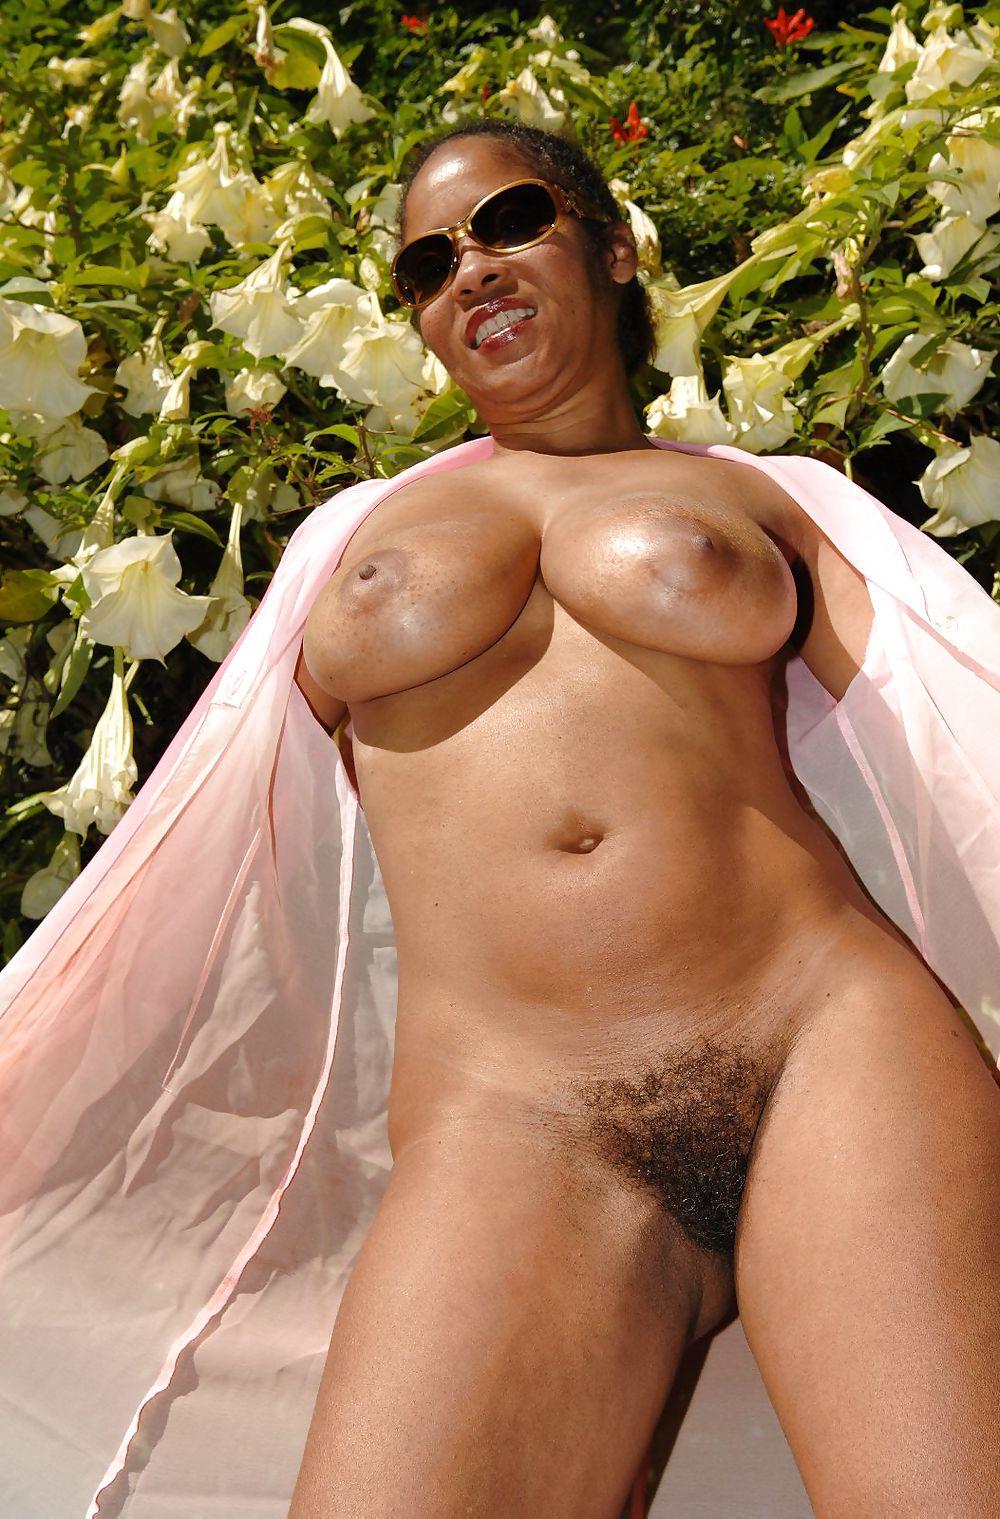 Nikki brazil